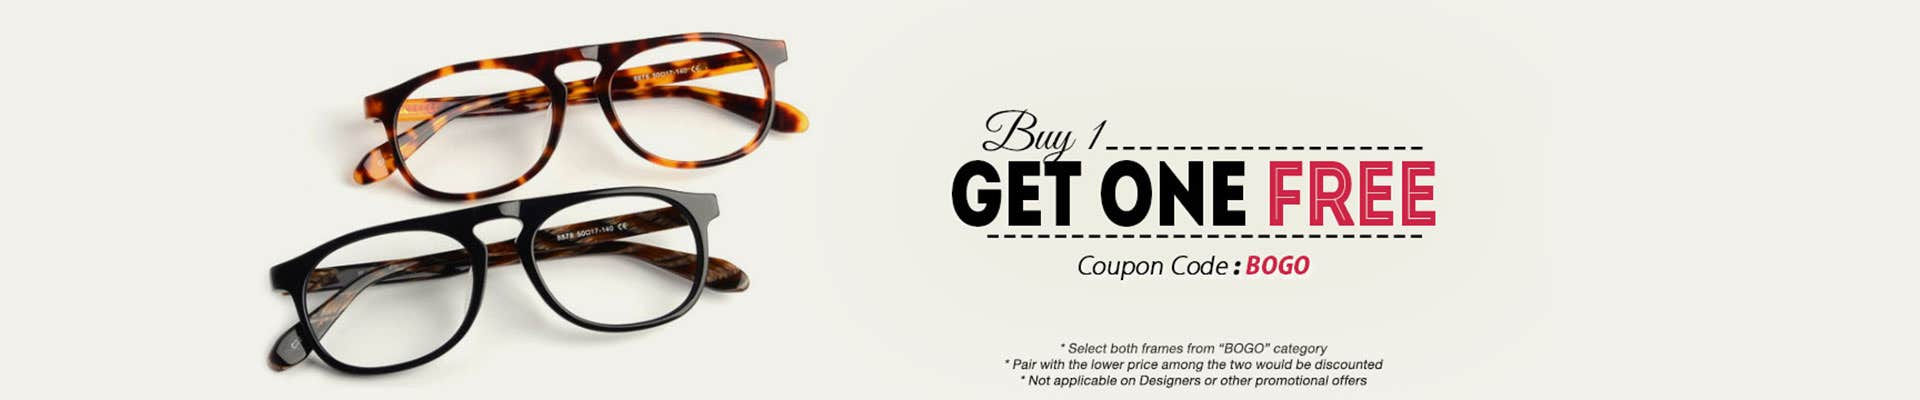 BOGO - Buy One Get One